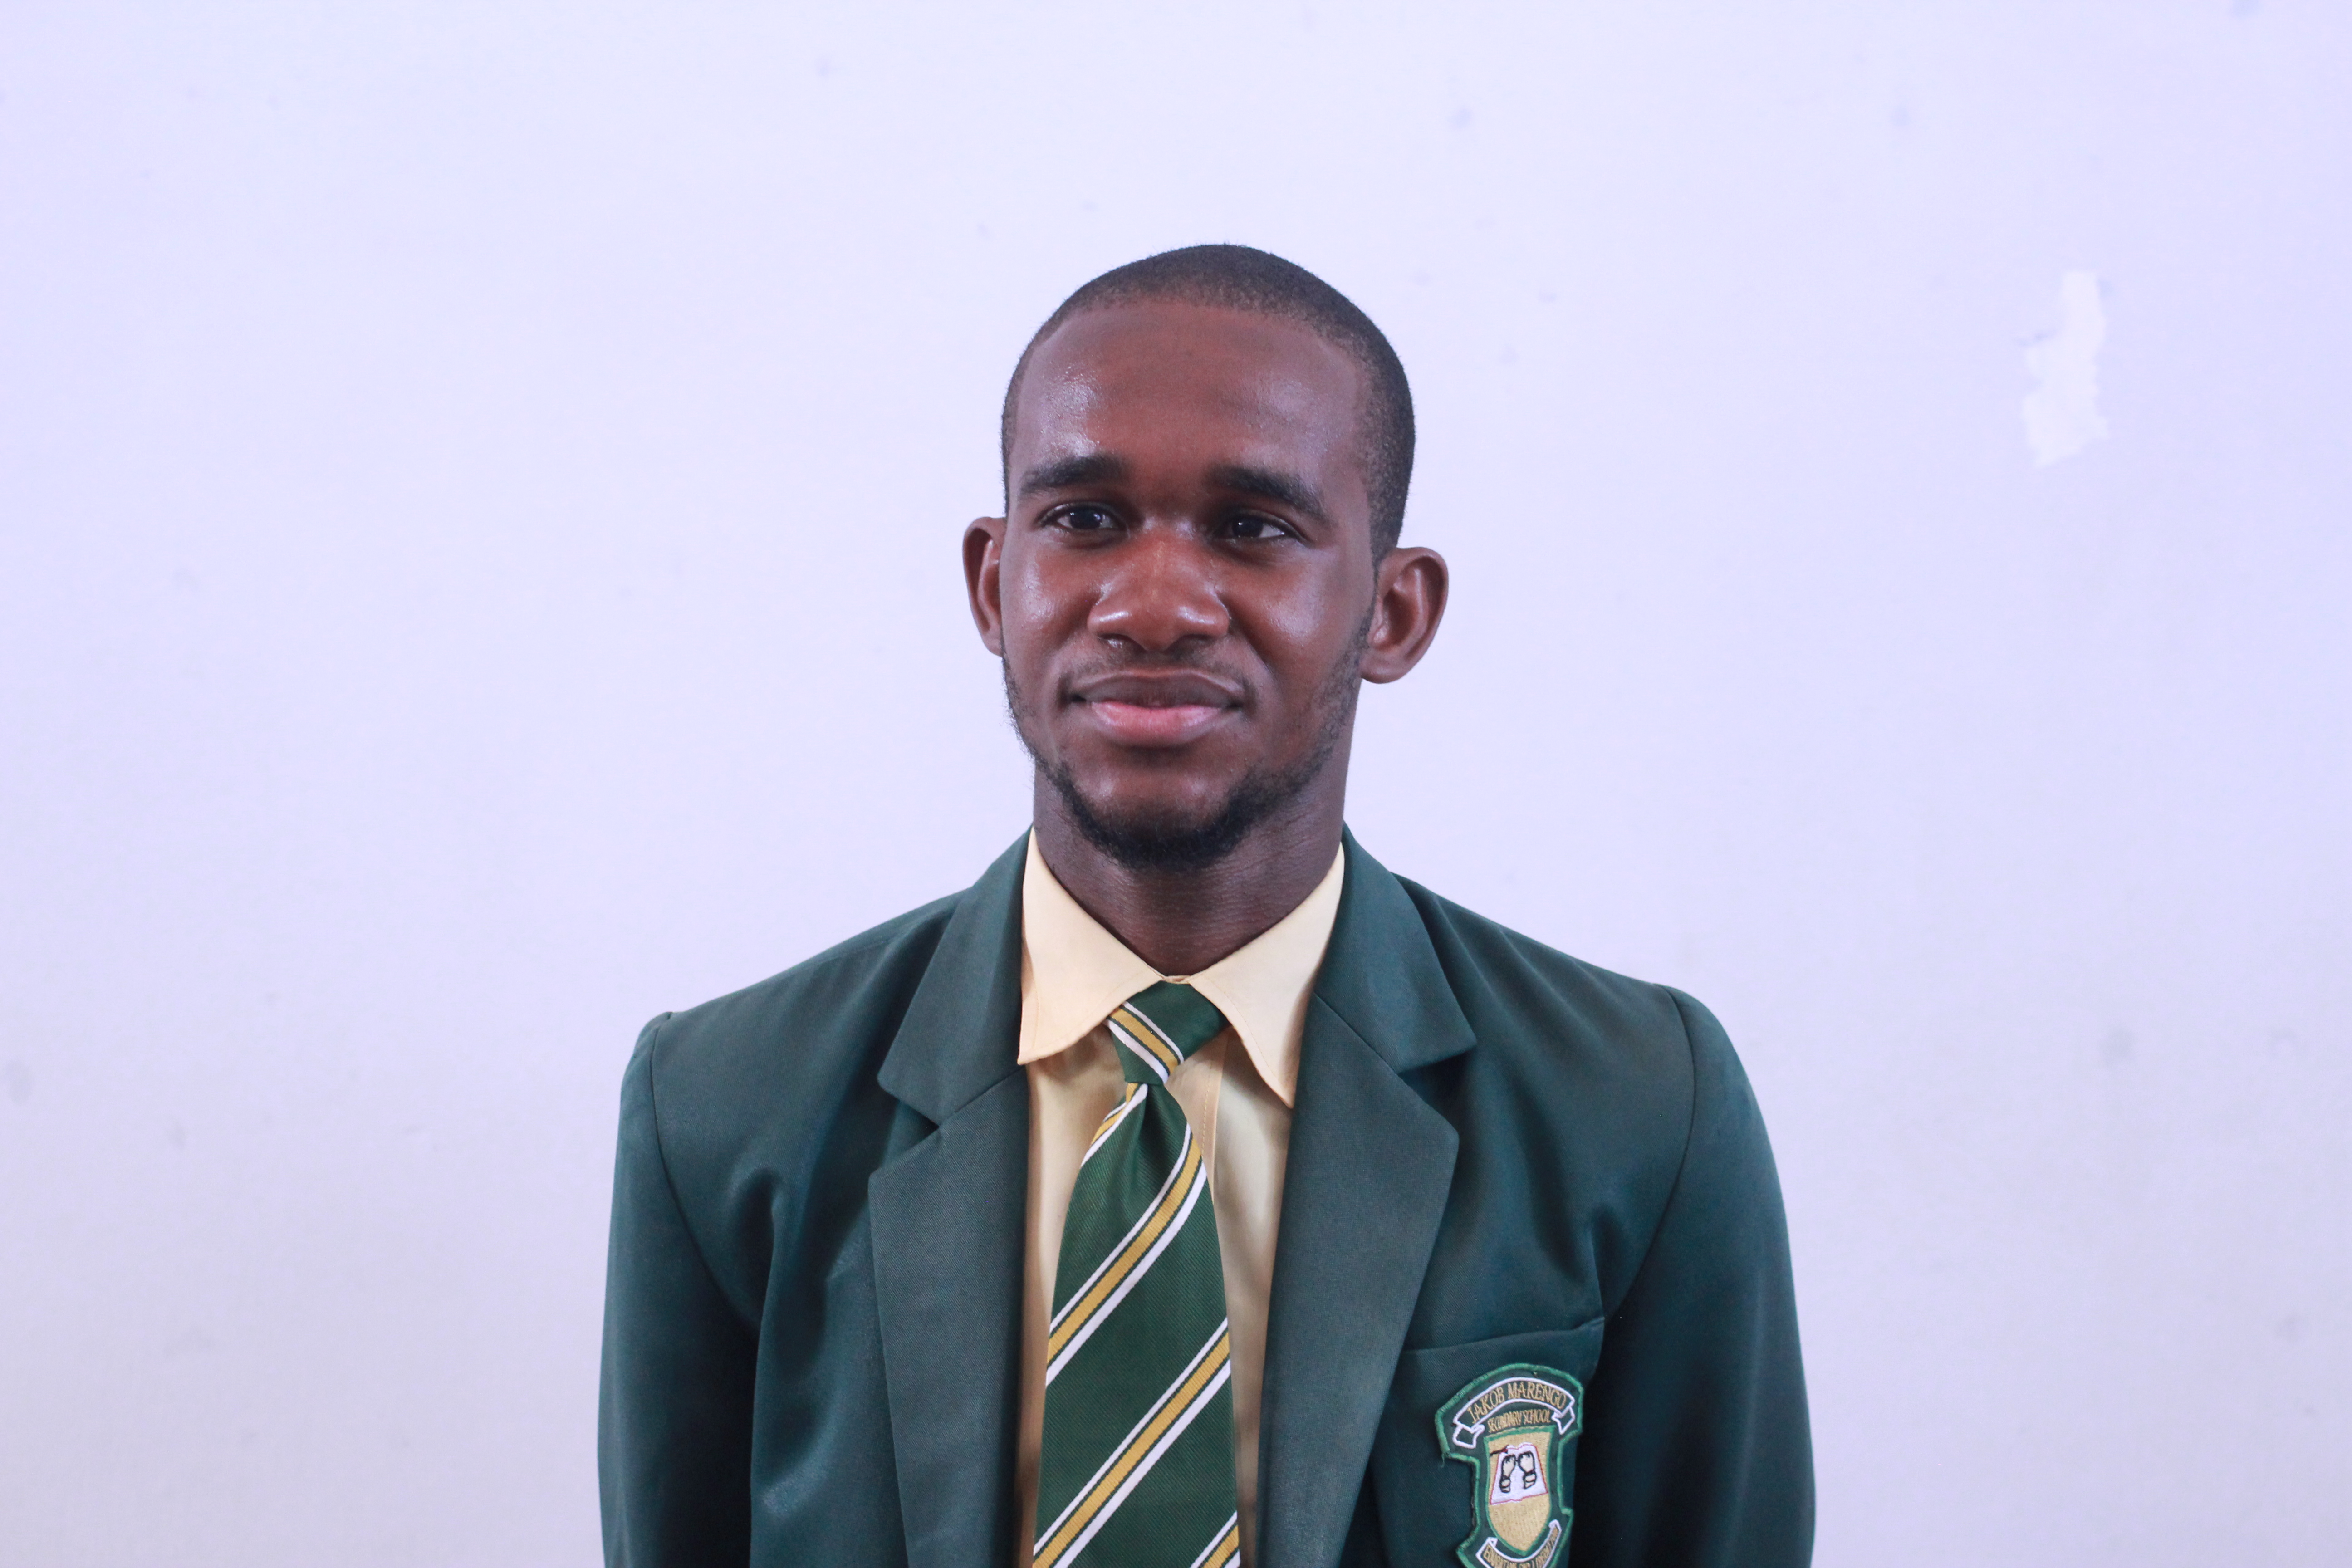 Tura pupil excels after tough journey